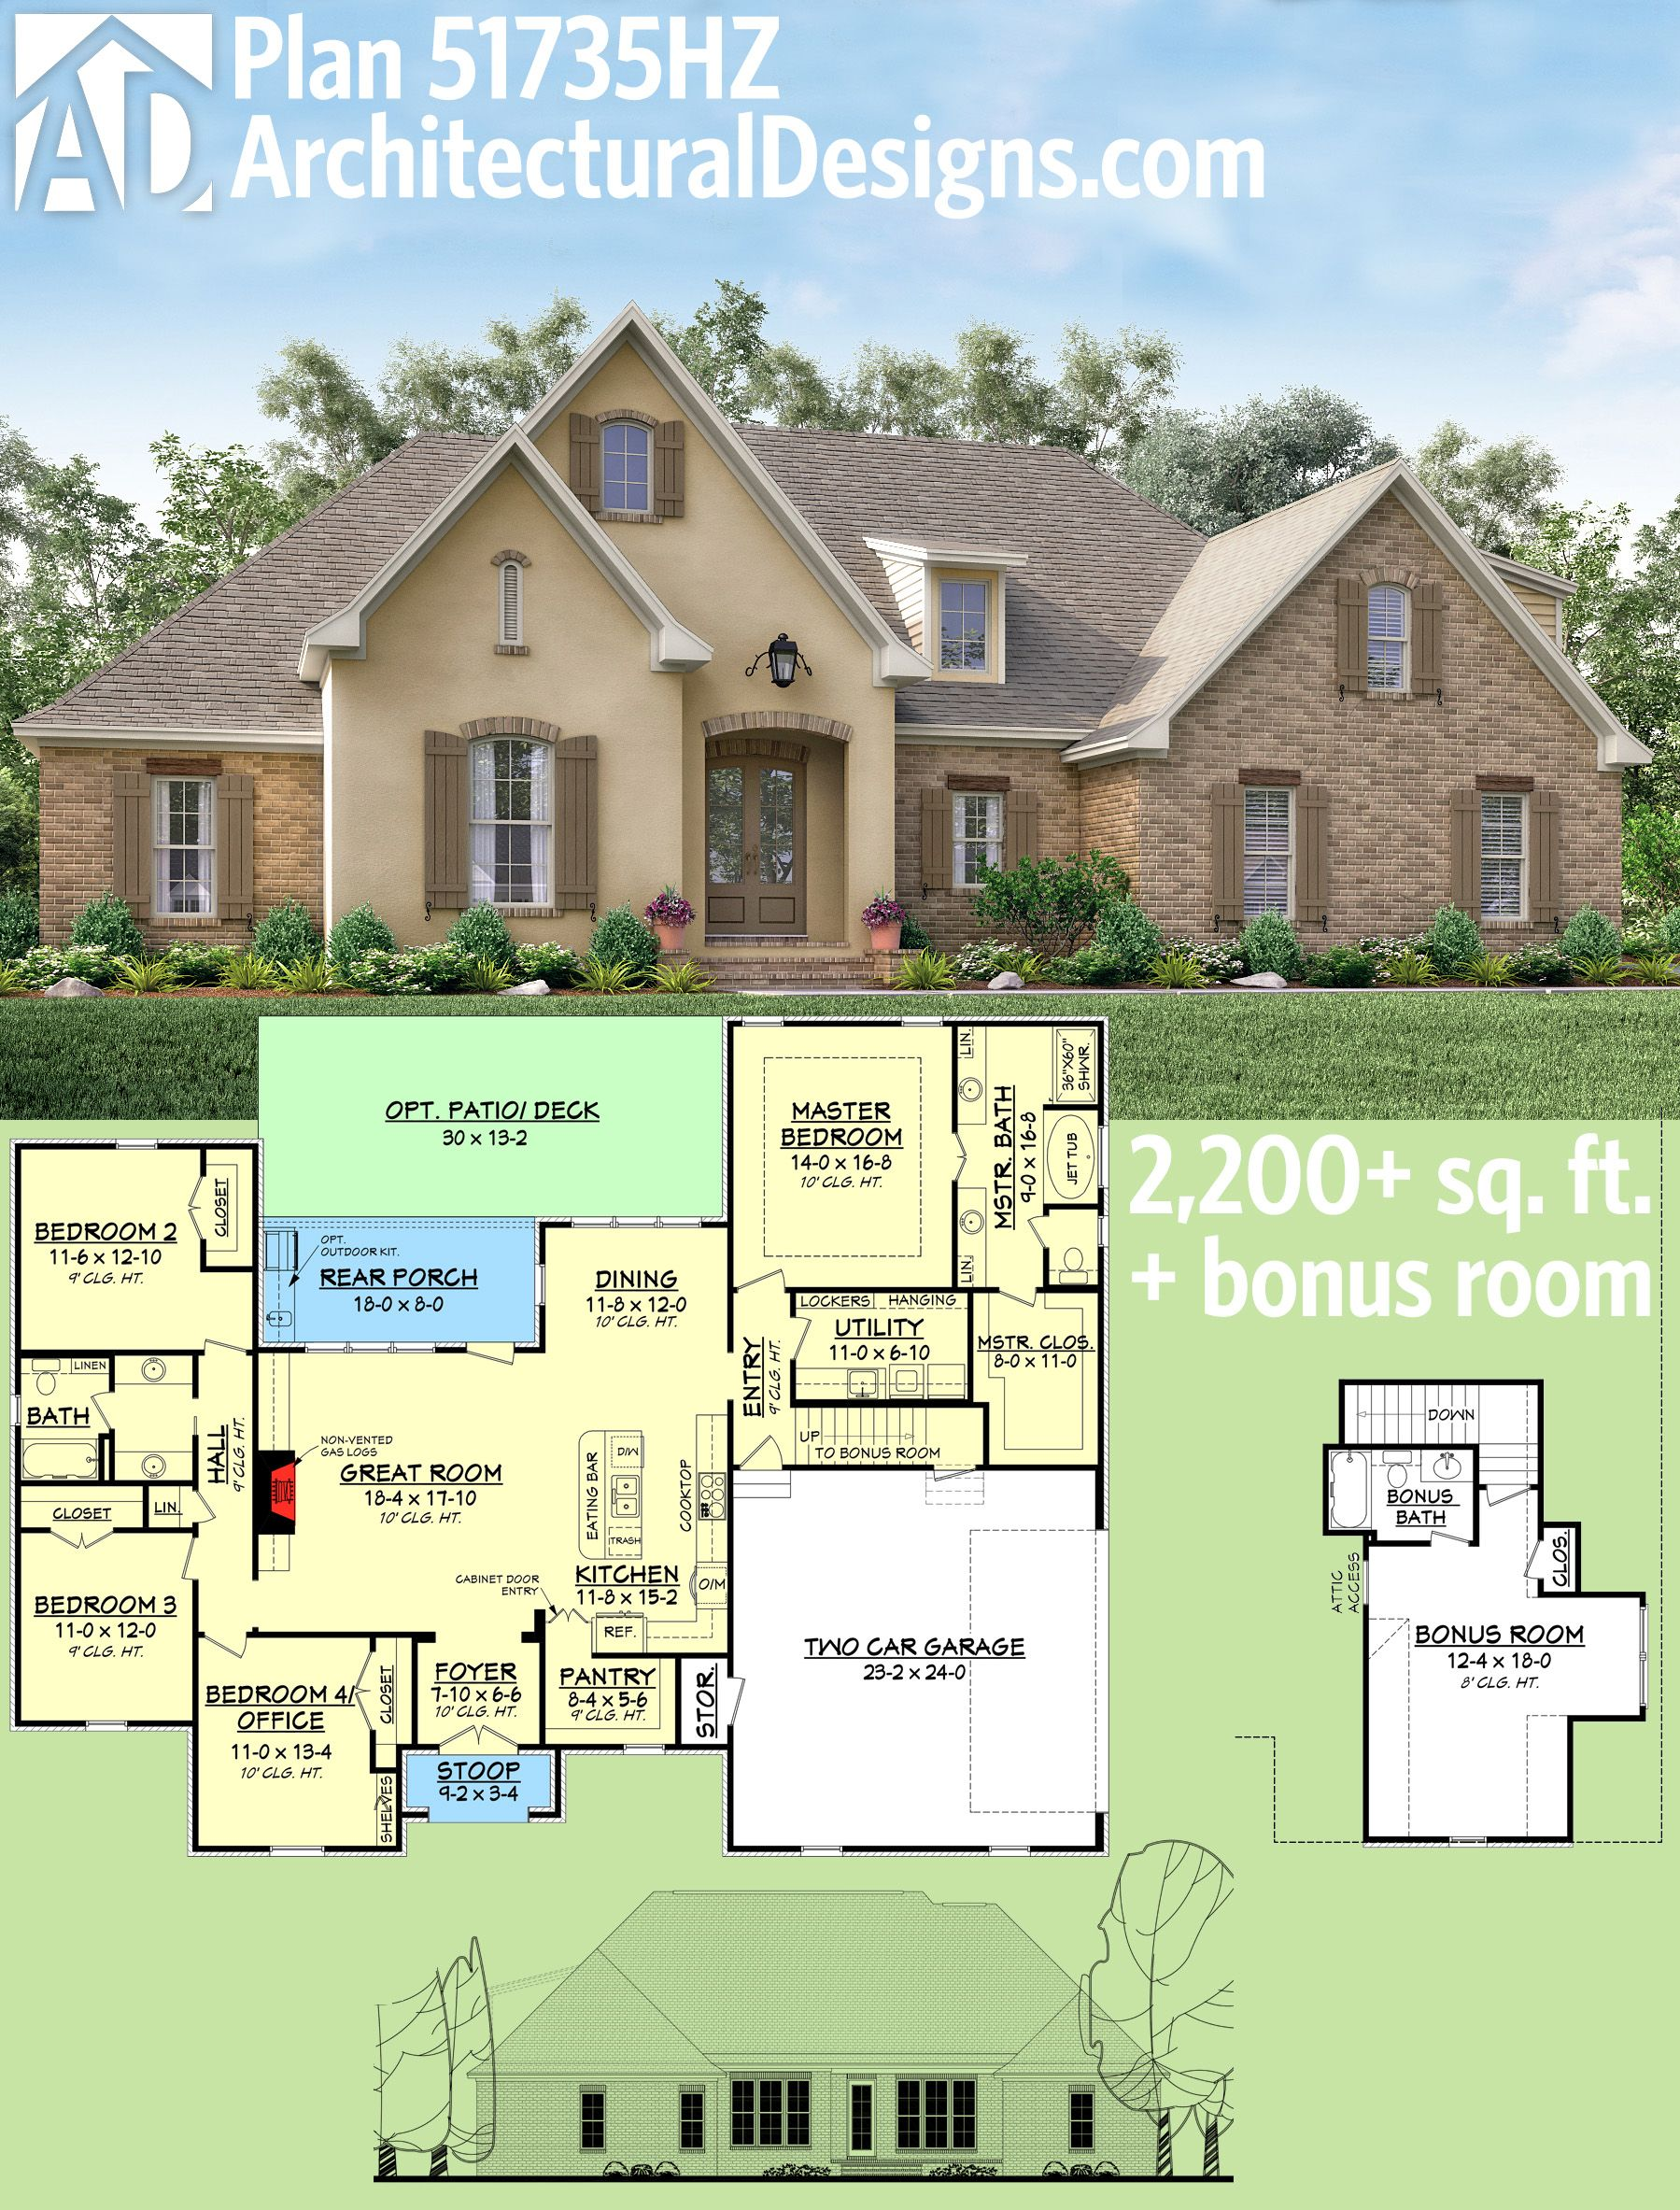 Plan 51735hz Flexible Southern Home Plan With Bonus Room